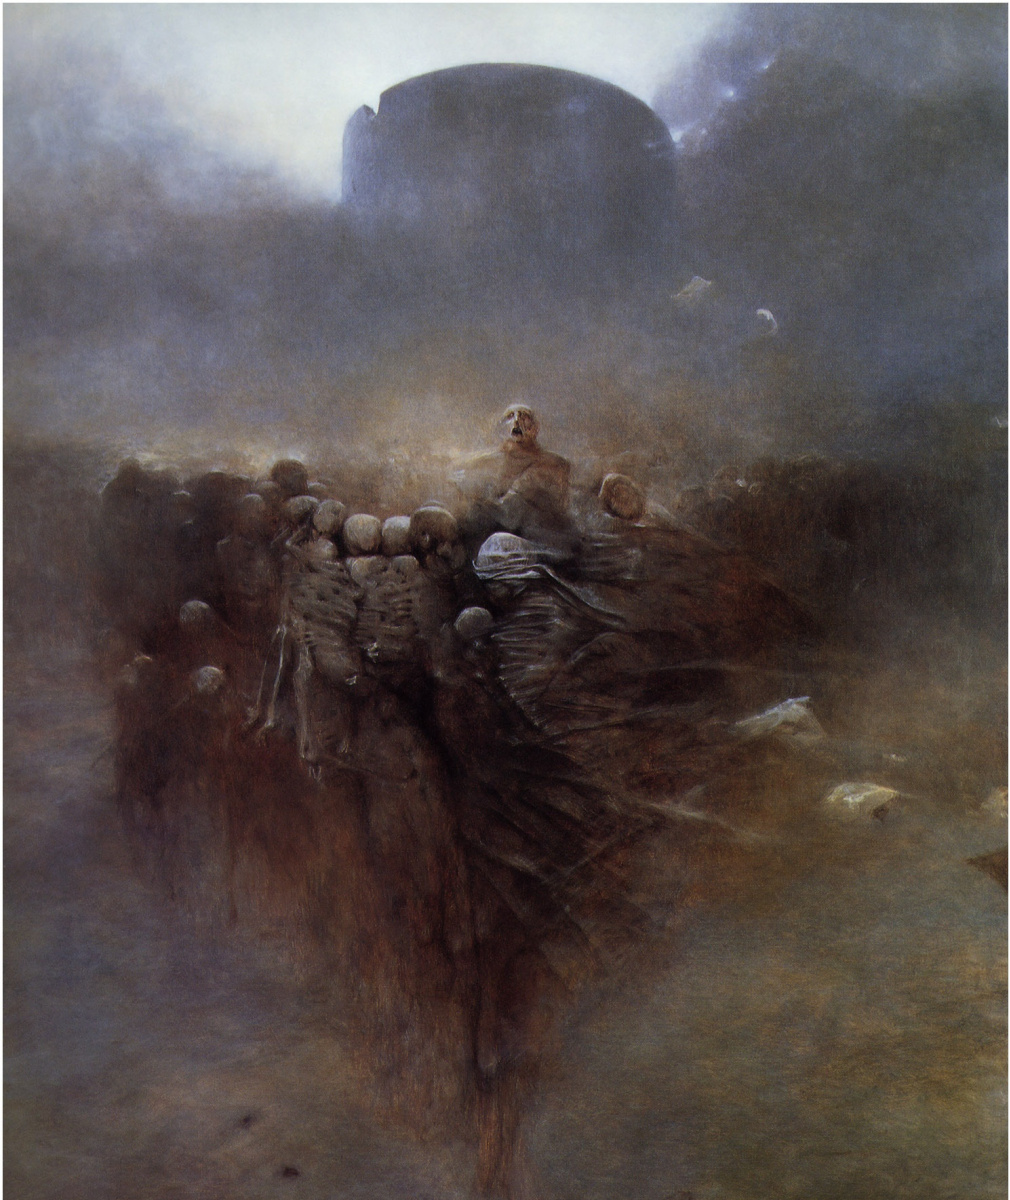 Zdzislaw Beksinsky. Plot 145